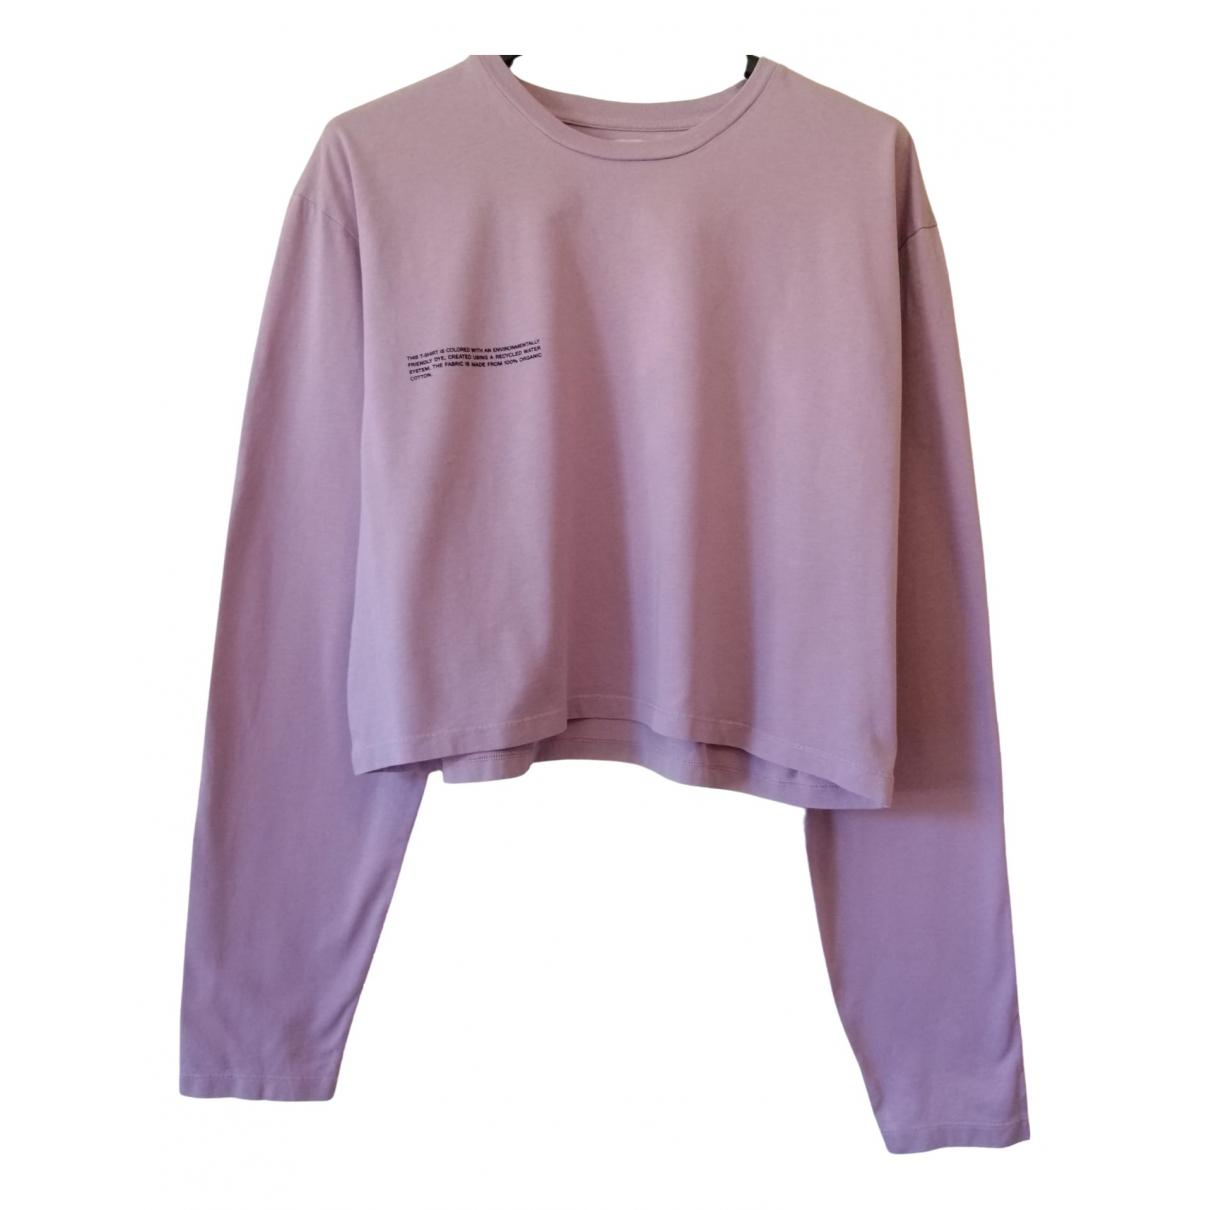 The Pangaia \N Cotton  top for Women L International